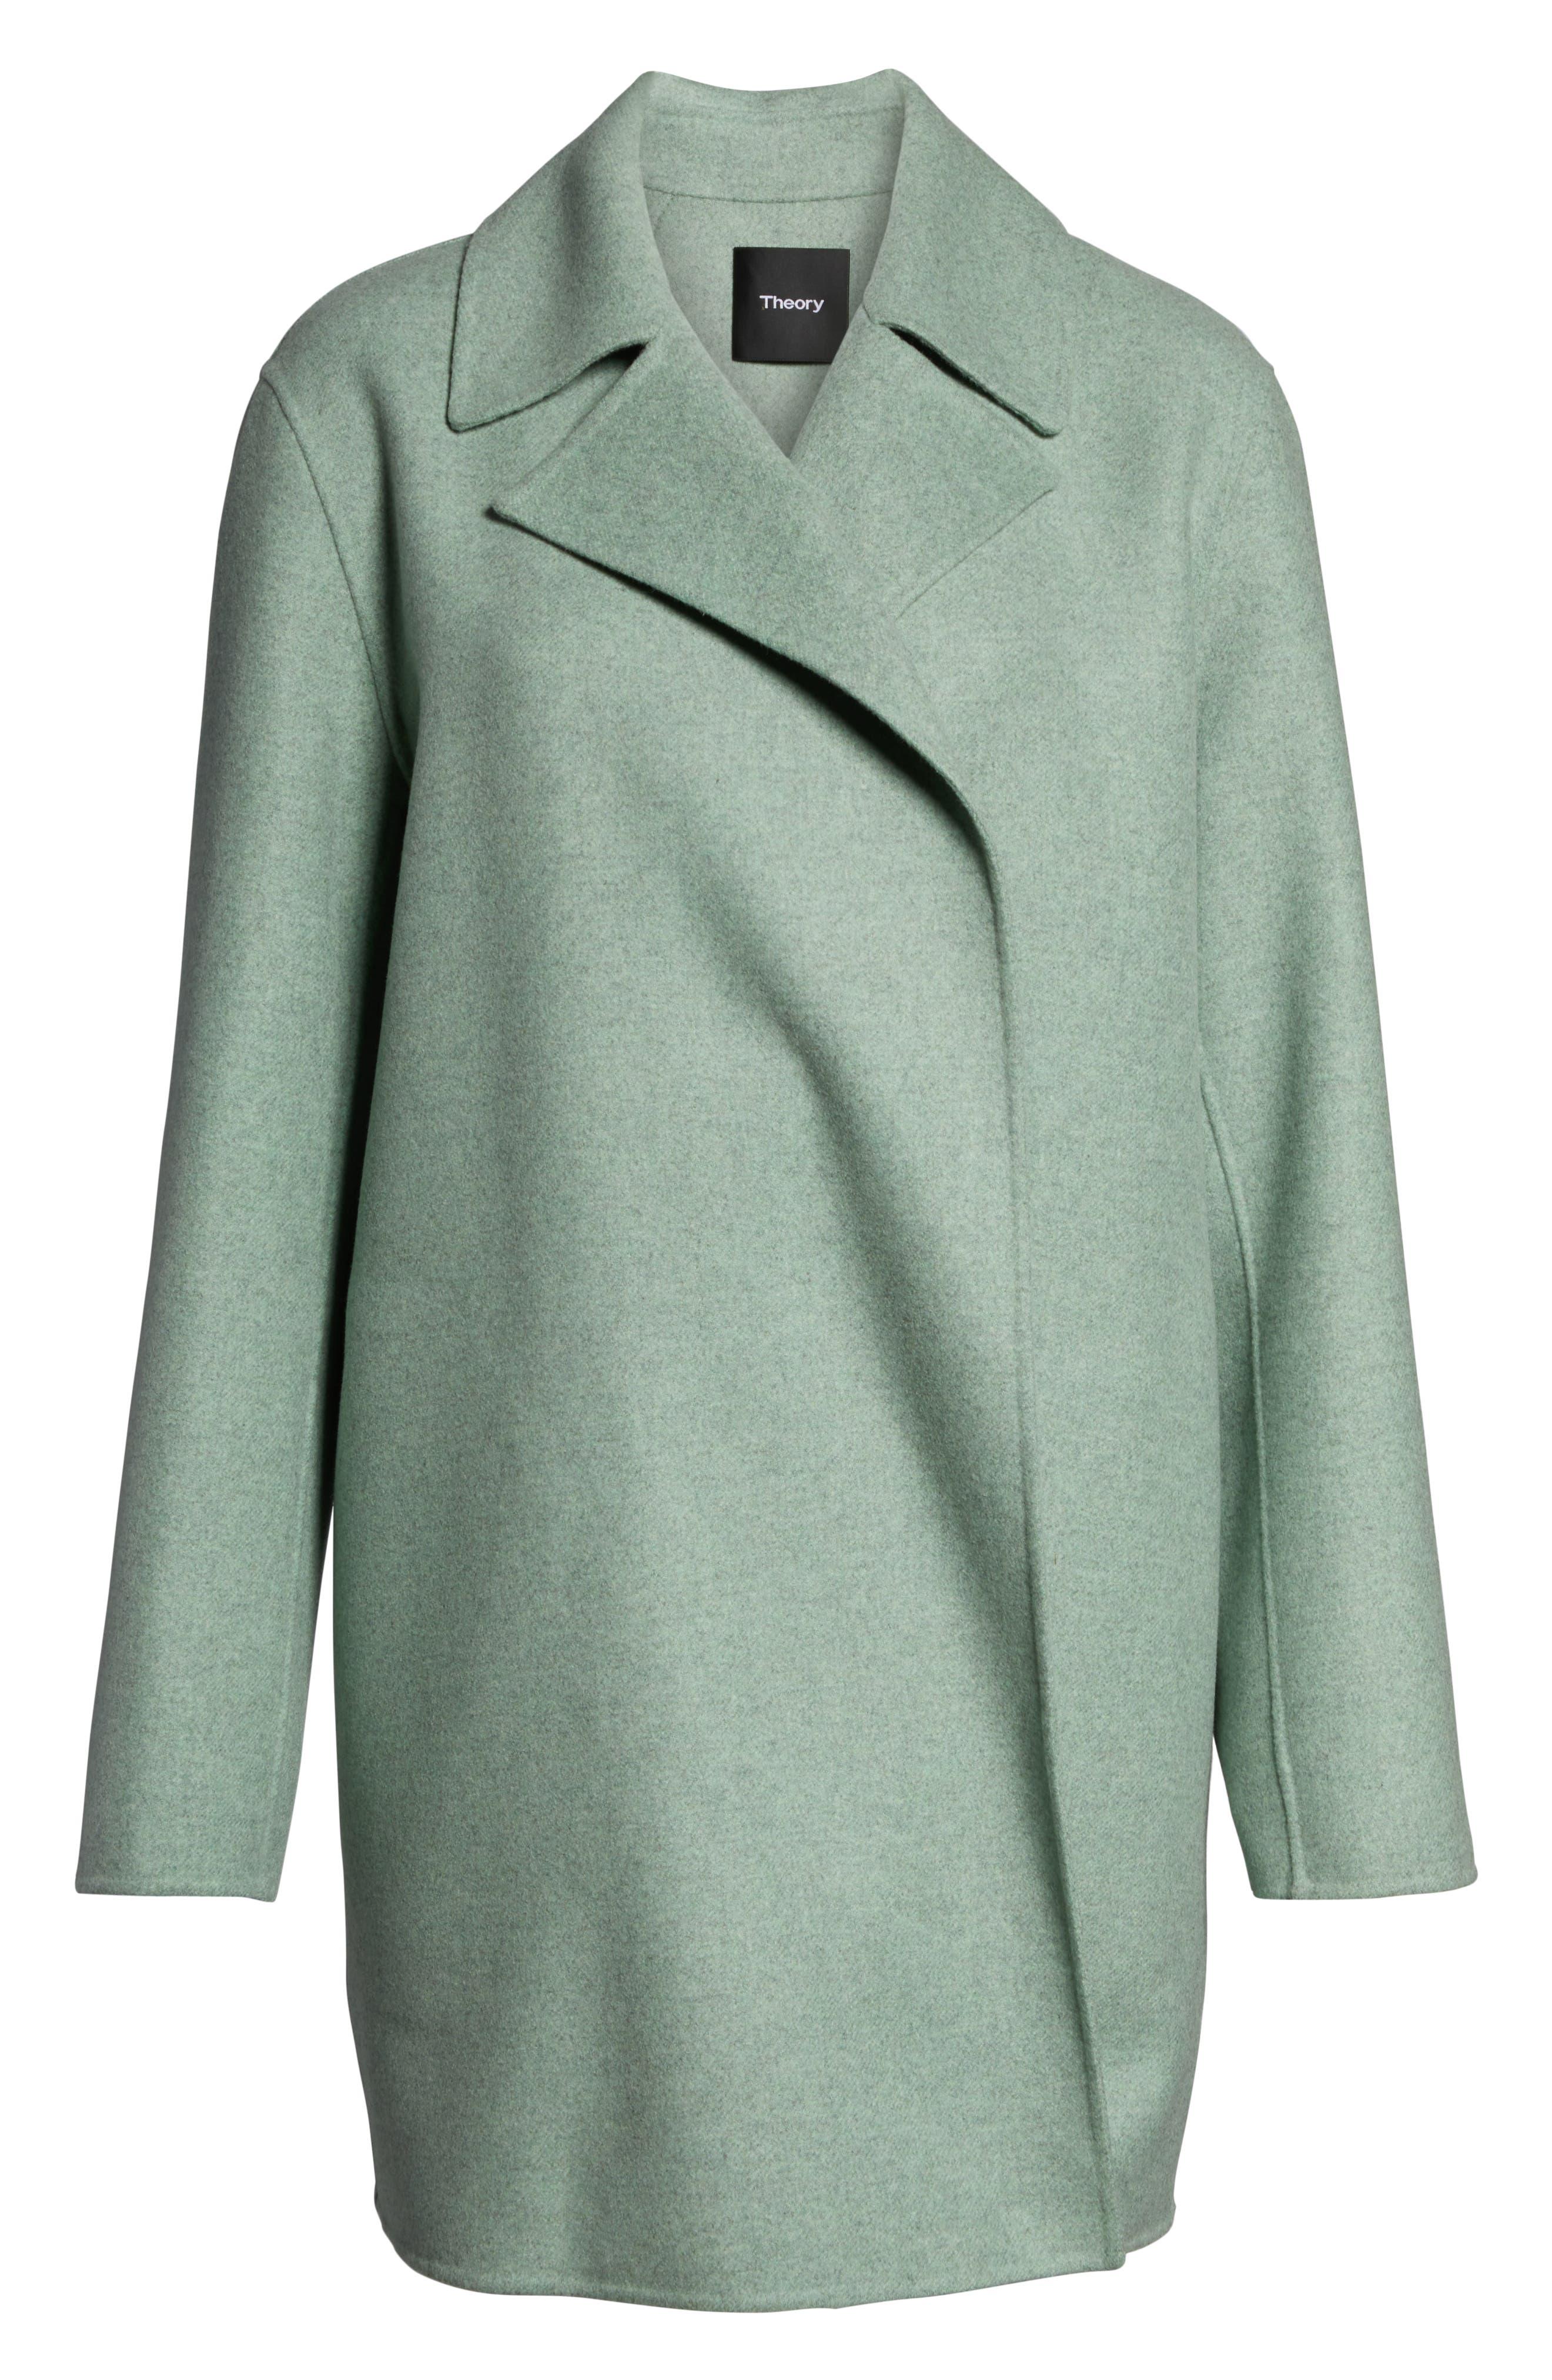 THEORY,                             Double Face Mélange Coat,                             Alternate thumbnail 4, color,                             OPAL GREEN MELANGE